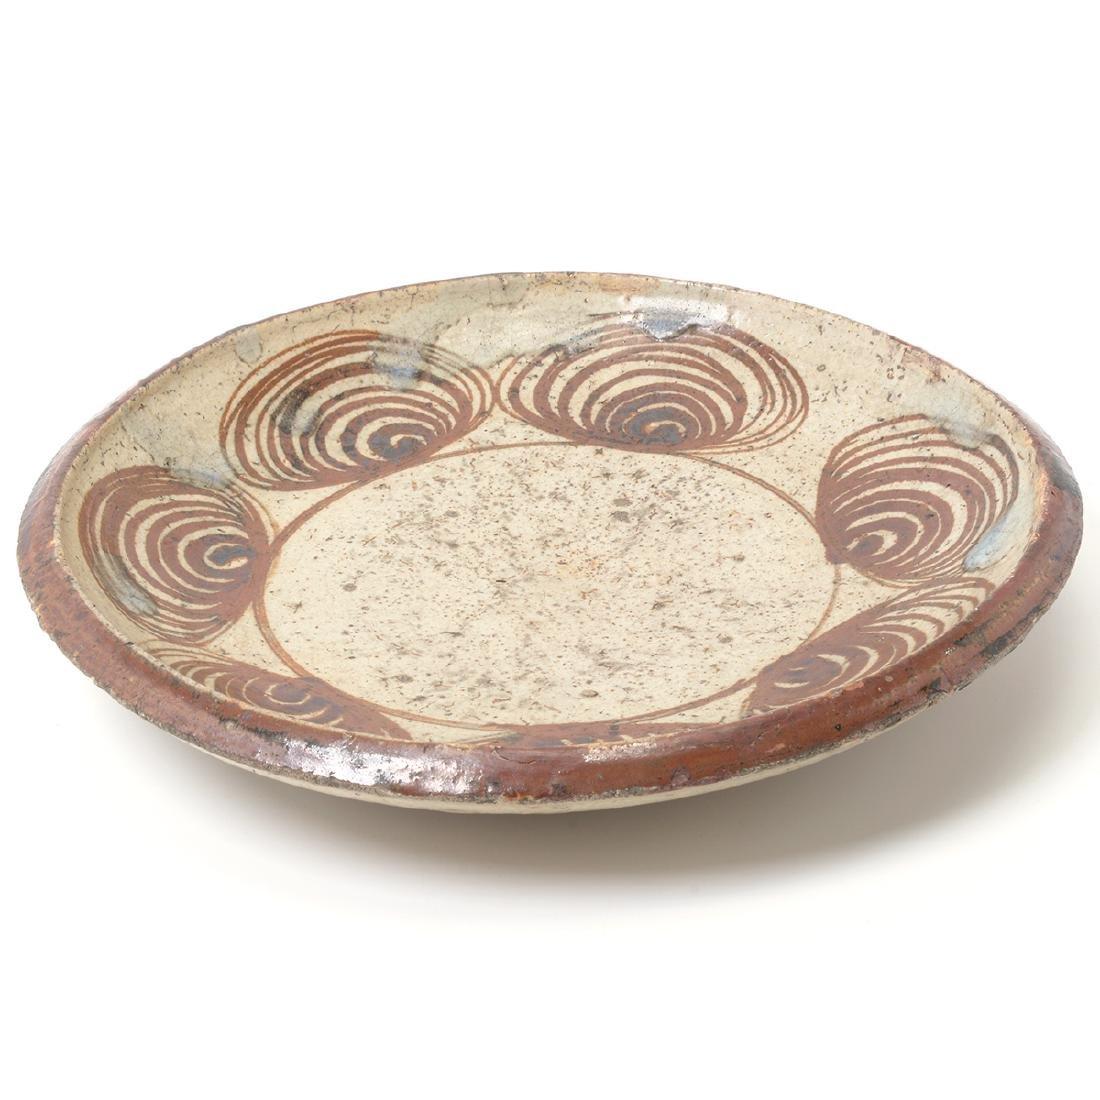 Japanese Mingei 'Horse-Eye' Dish, Edo Period